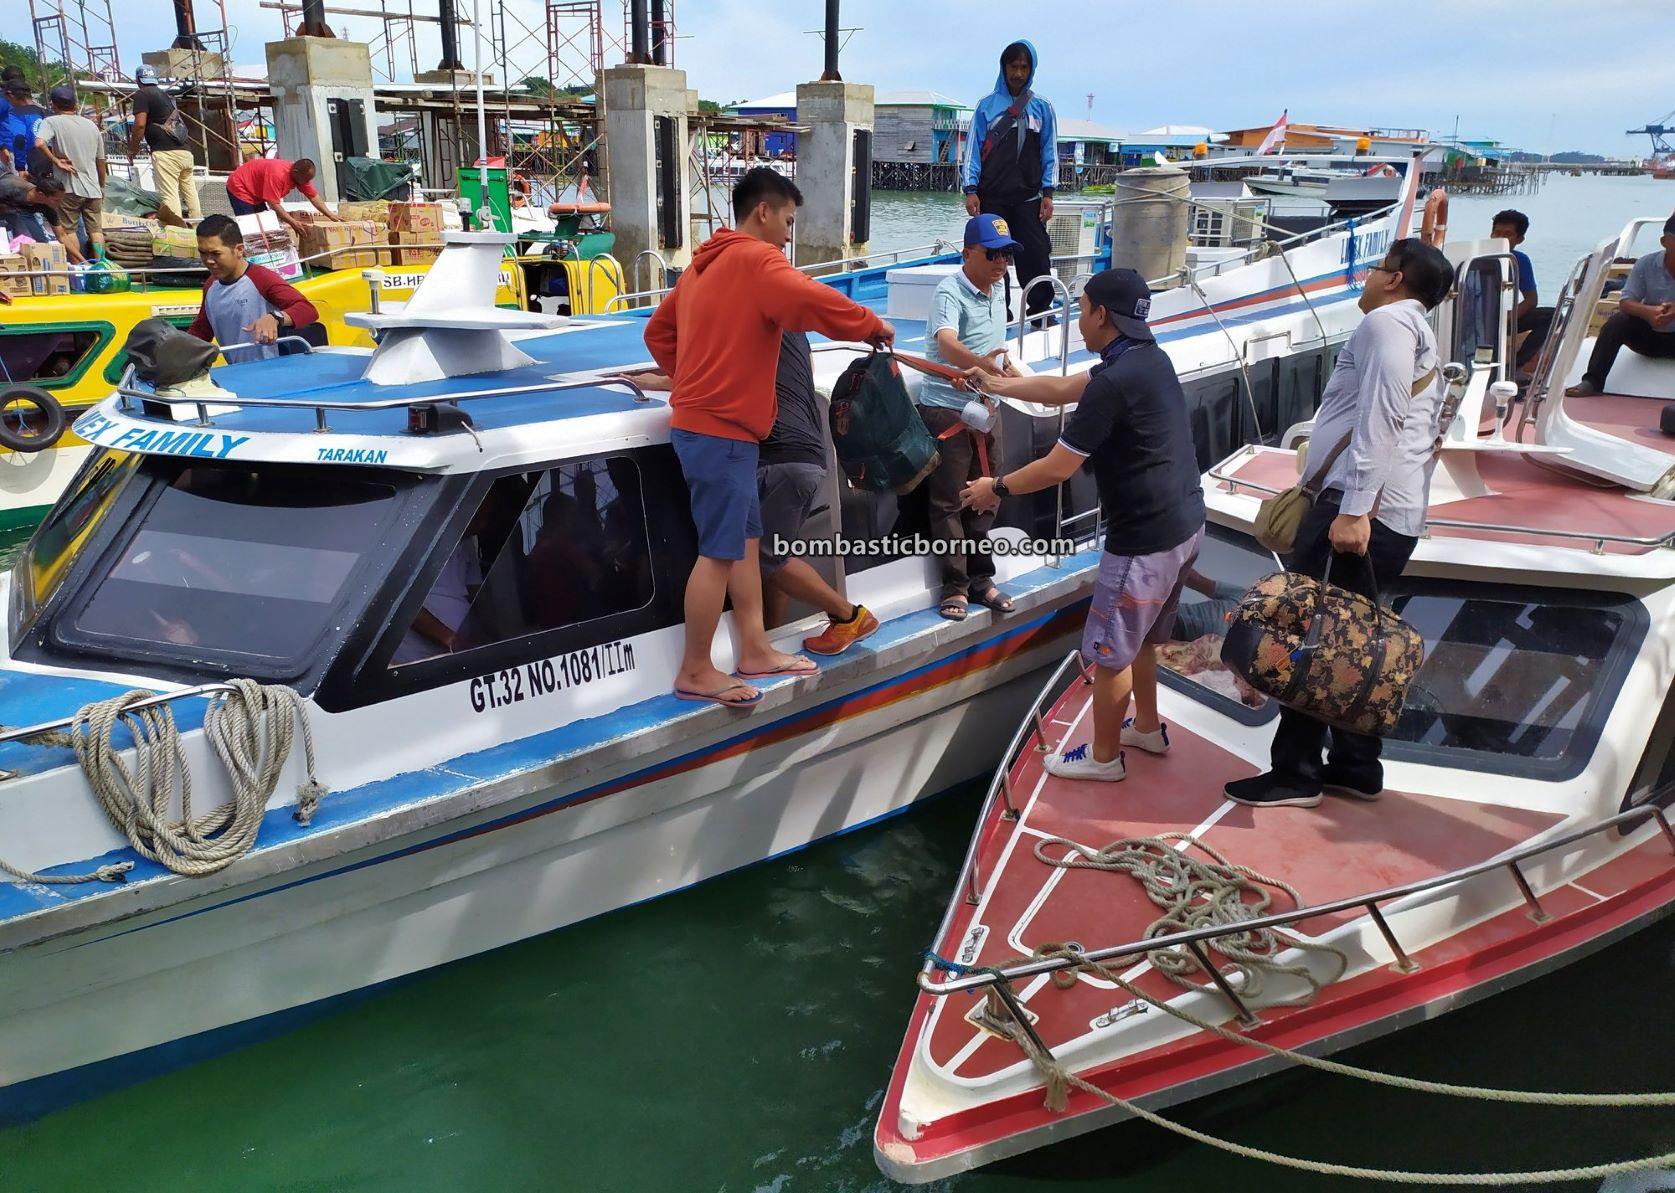 Express Boat ride, adventure, speed boat, backpackers, exploration, Indonesia, North Kalimantan, Kaltara, Kota Tarakan, Pulau Derawan, Pelabuhan Tengkayu, Pariwisata, Tourism, travel guide, Borneo